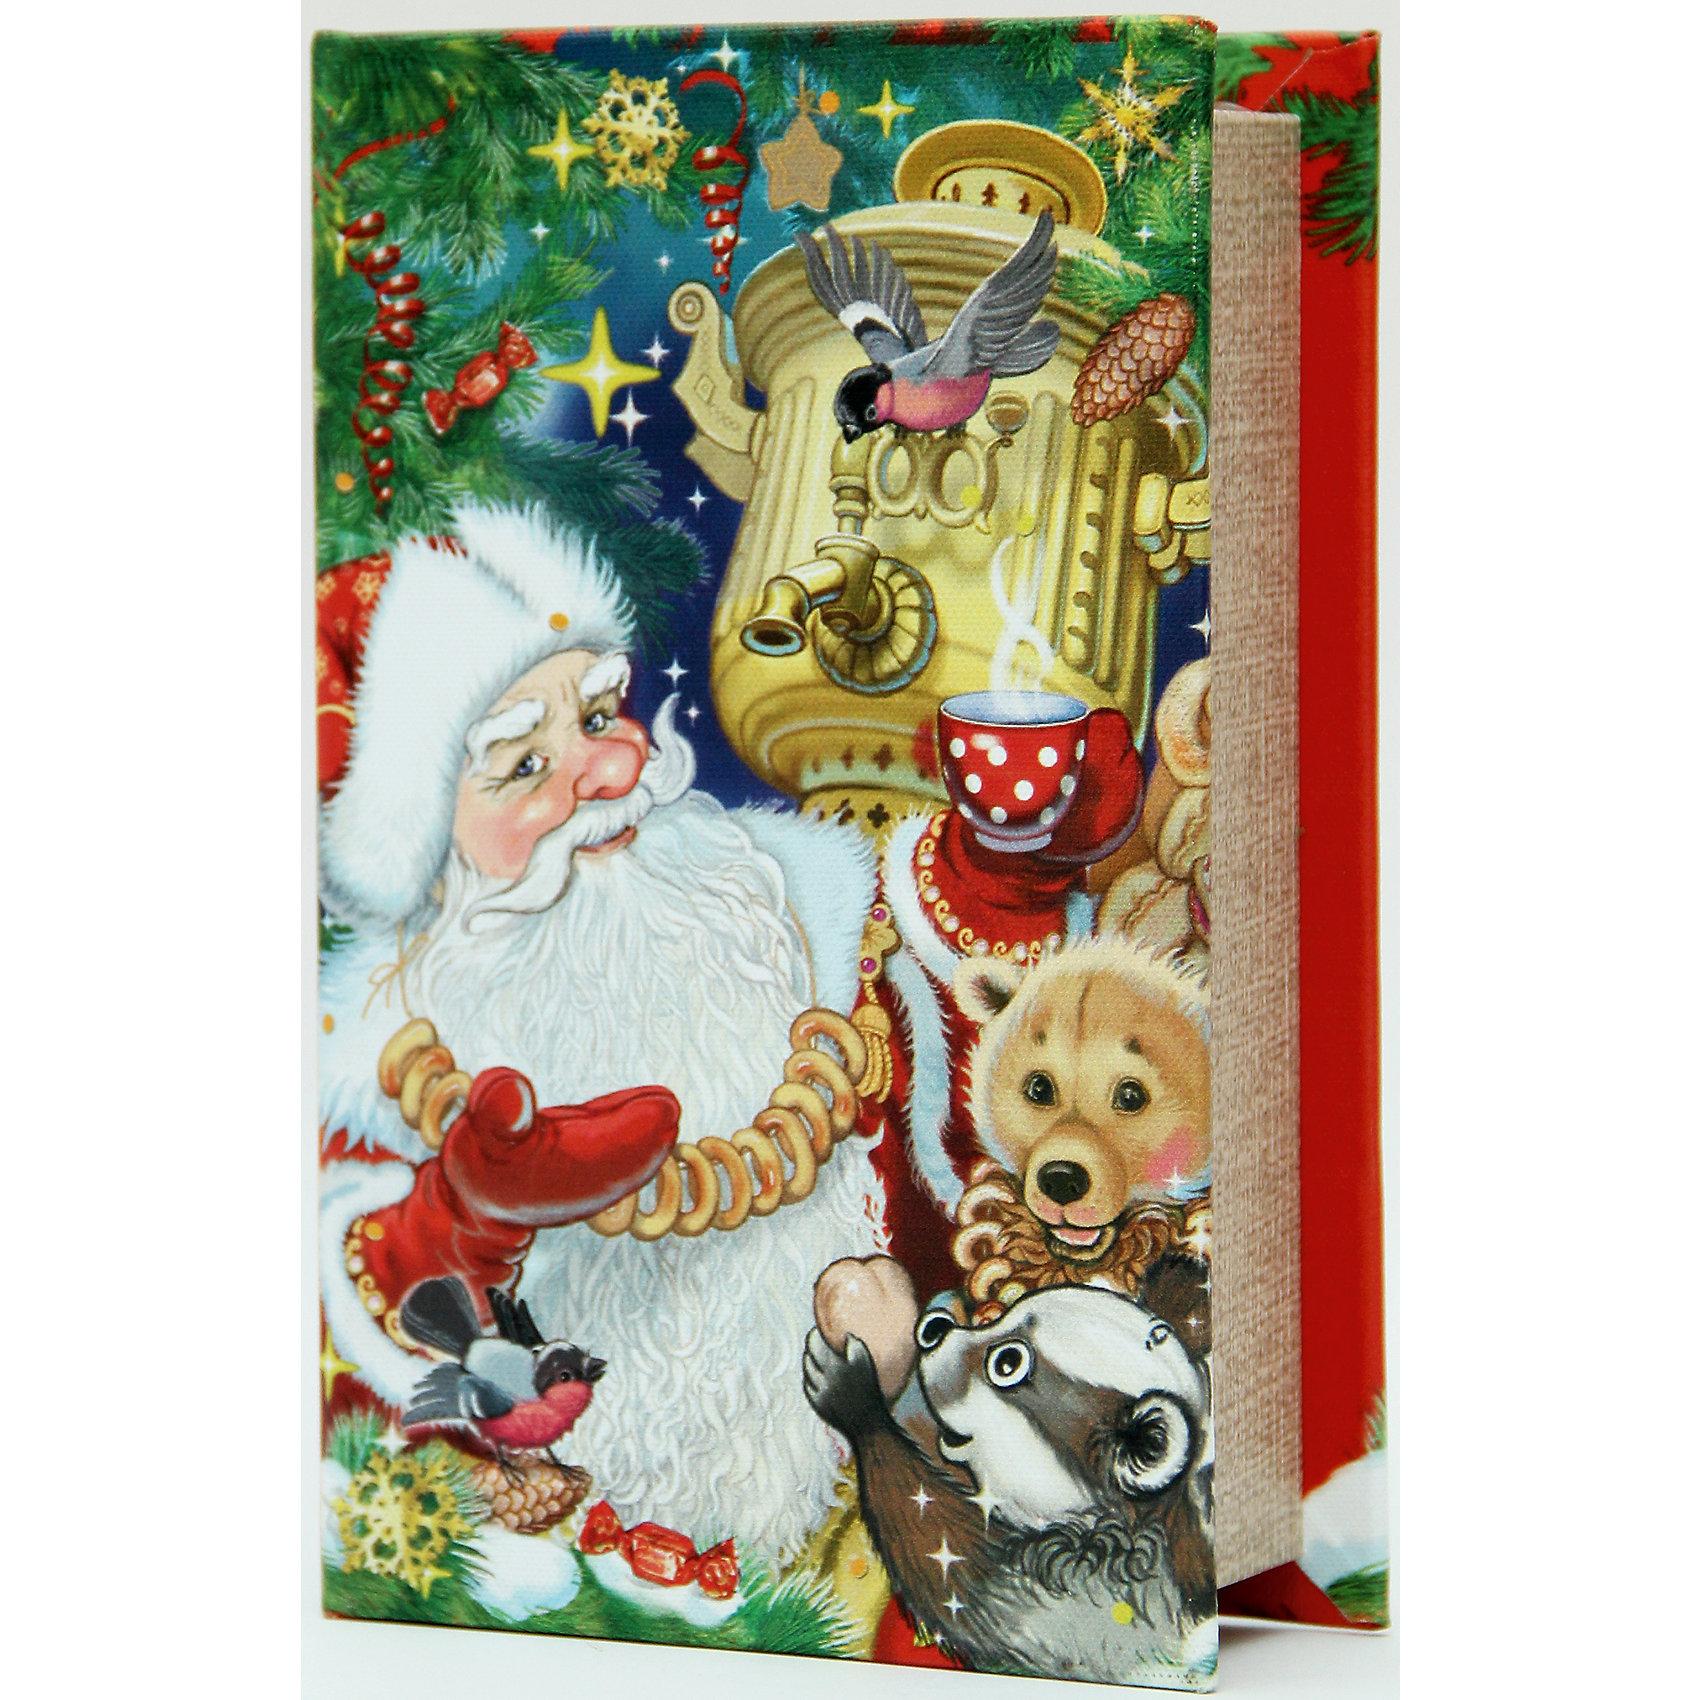 Декоративная шкатулка Дед Мороз с самоваром  (17*11*5, из МДФ)Всё для праздника<br>Декоративная шкатулка Дед Мороз с самоваром арт.38472 (17*11*5чс, из МДФ) / 17*11*5 арт.38472<br><br>Ширина мм: 180<br>Глубина мм: 120<br>Высота мм: 60<br>Вес г: 307<br>Возраст от месяцев: 60<br>Возраст до месяцев: 600<br>Пол: Унисекс<br>Возраст: Детский<br>SKU: 5144543